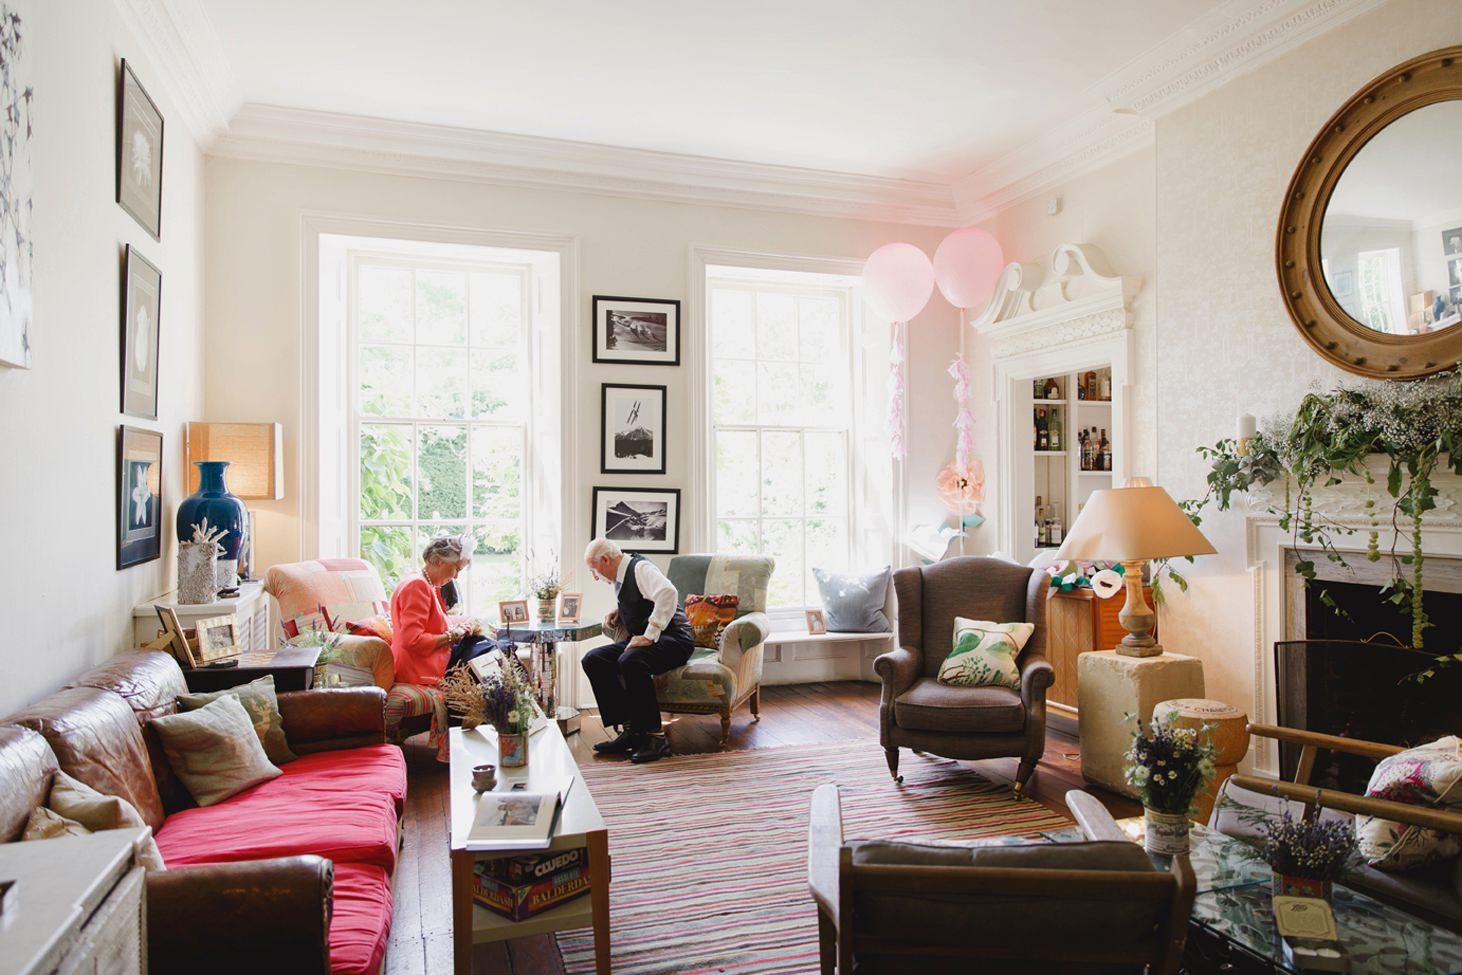 The Rectory Hotel wedding interior